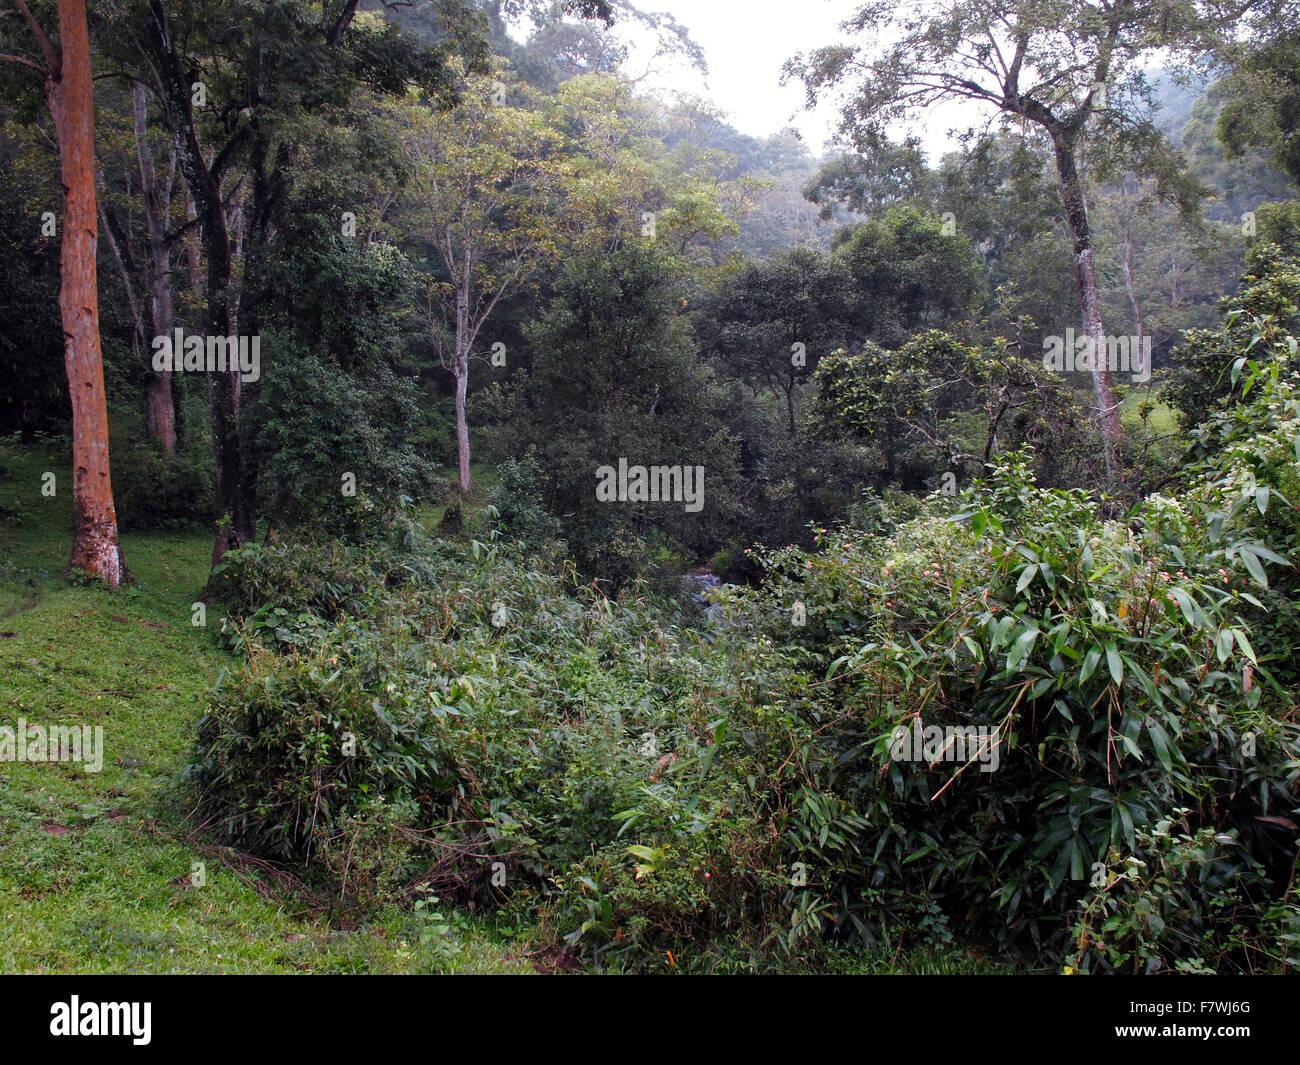 In the Periyar Tiger Reserve, Kerala, India Stock Photo